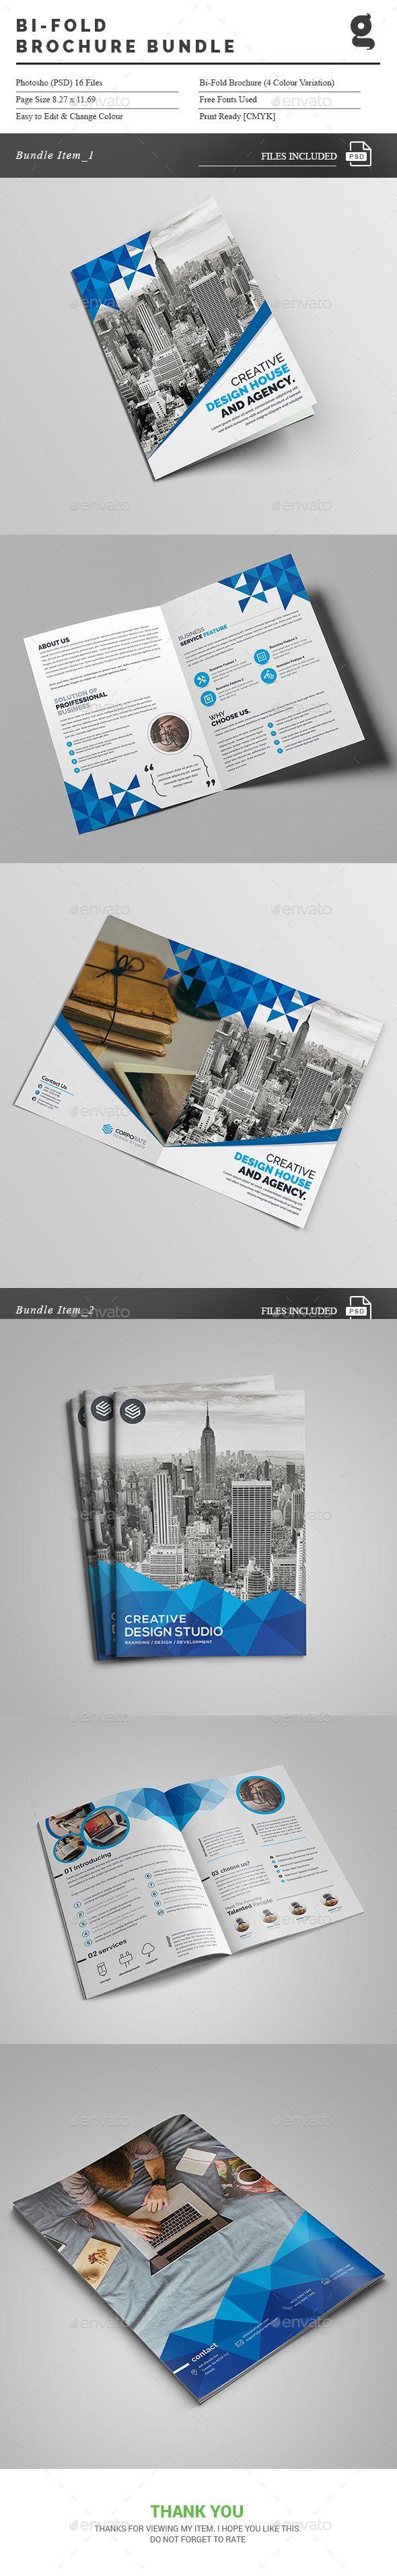 50 best Brochures images on Pinterest | Brochures, Brochure design ...